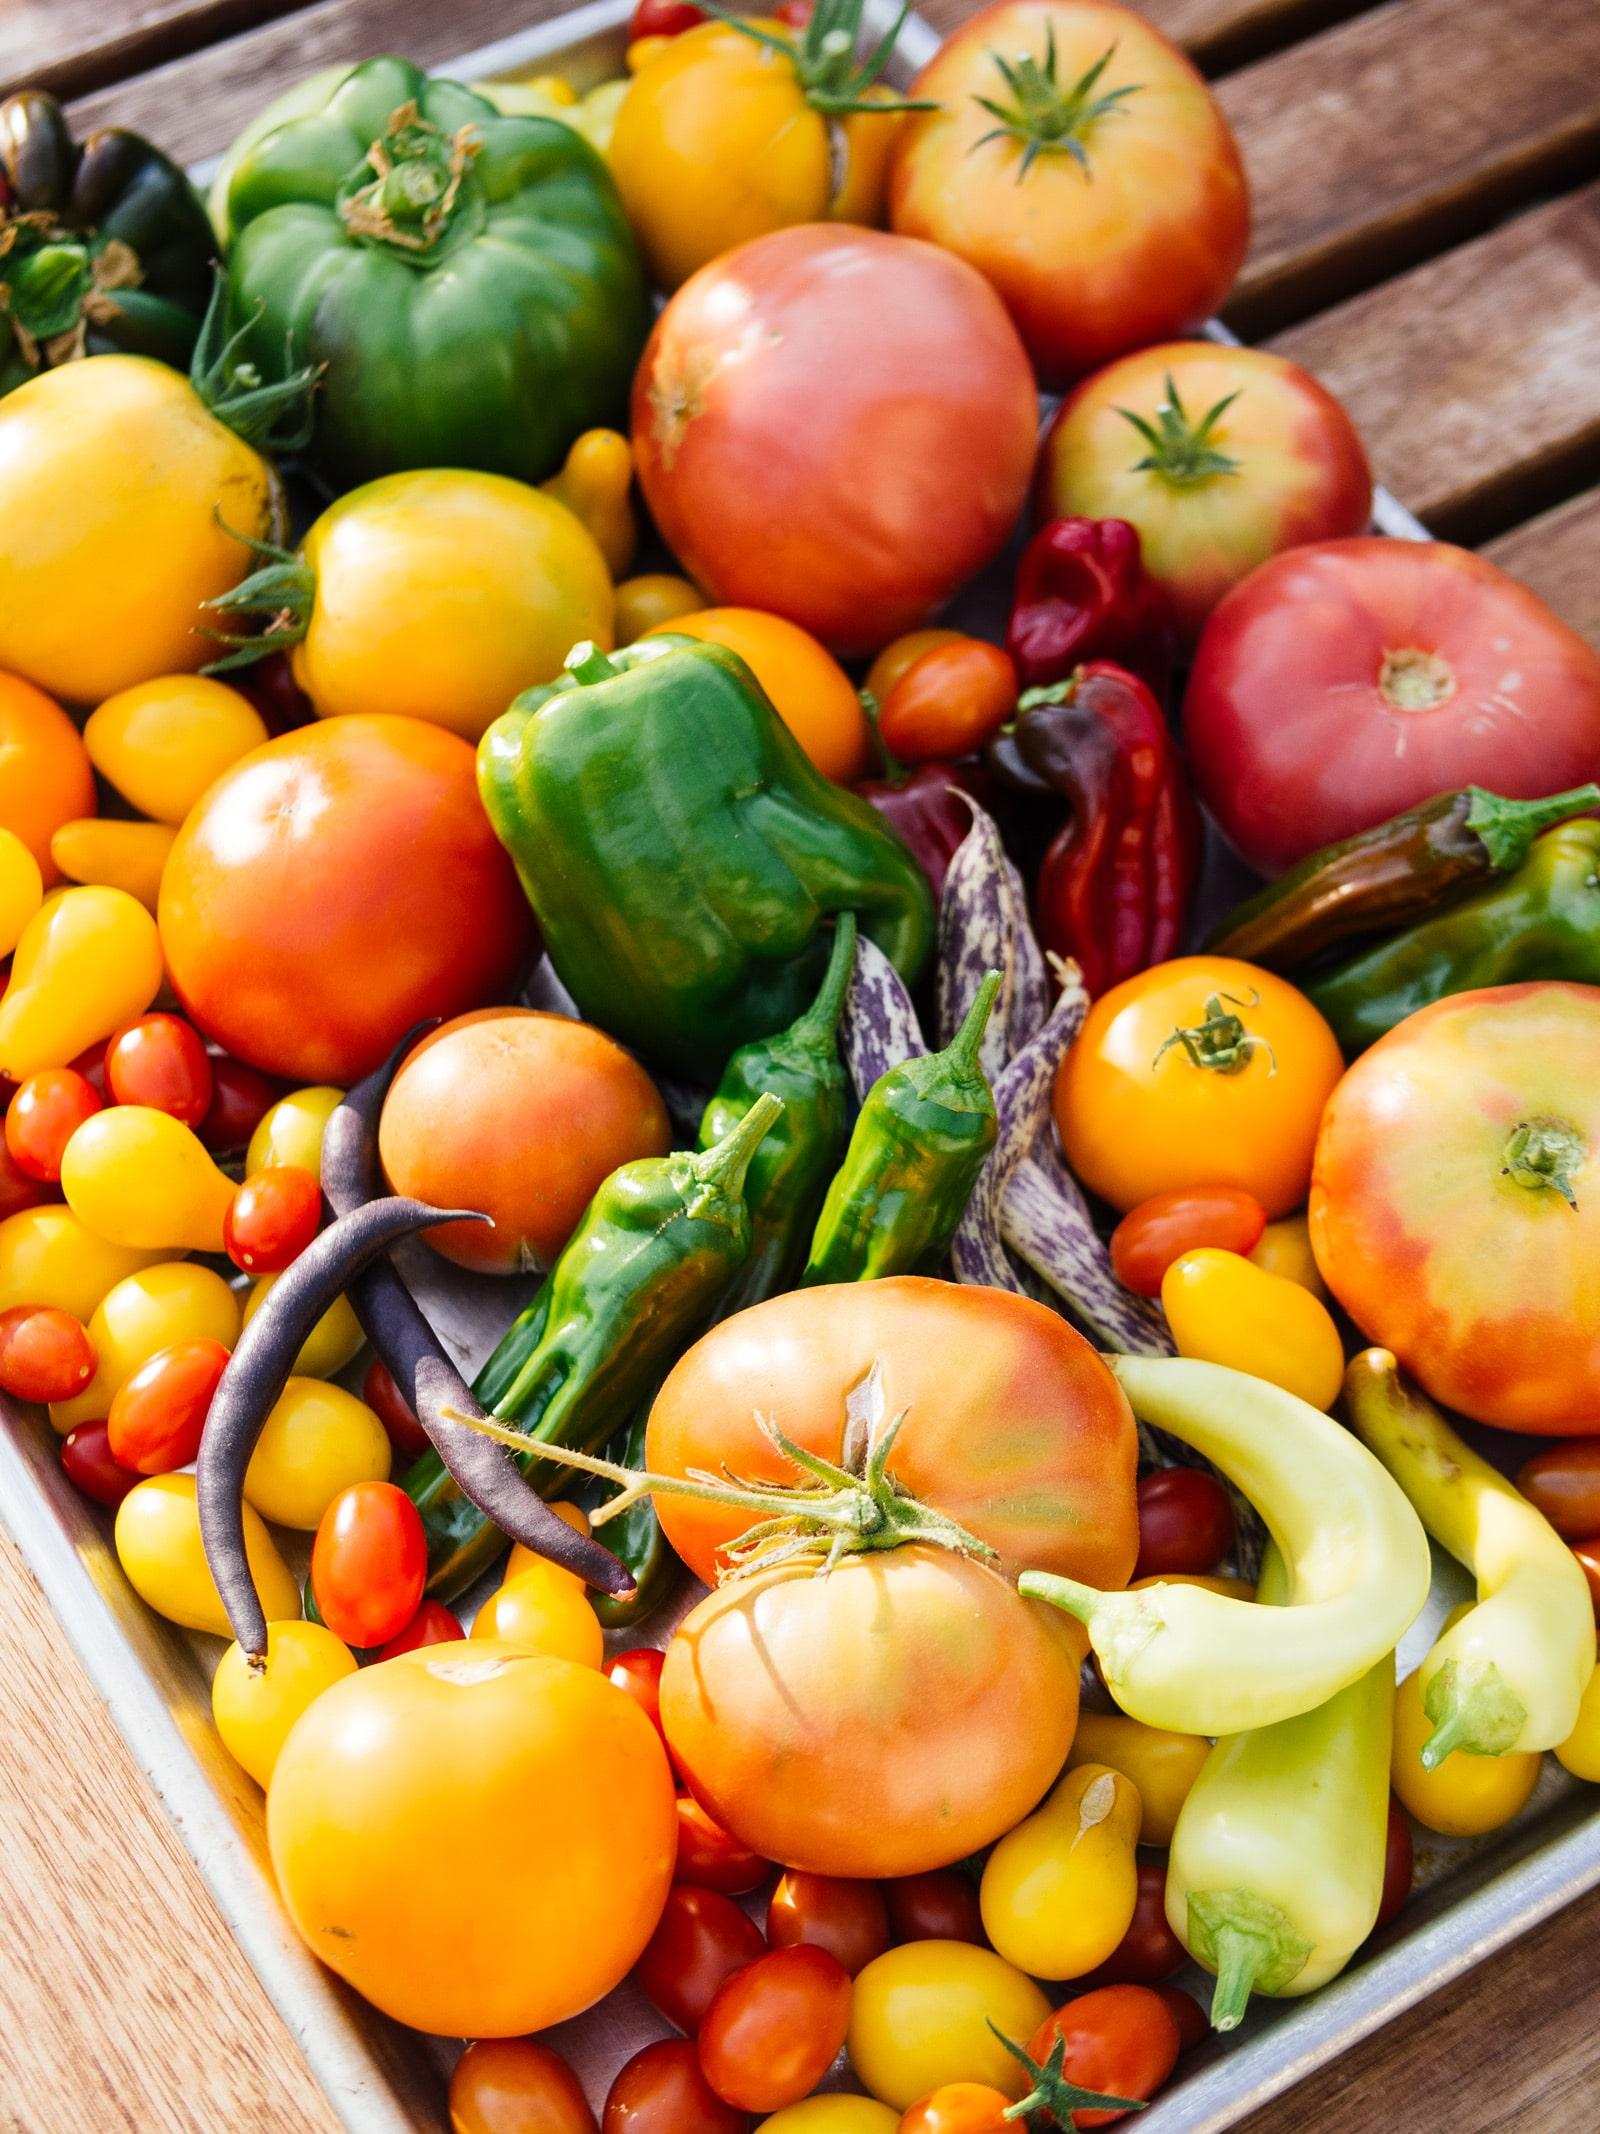 Harvest your remaining summer vegetables